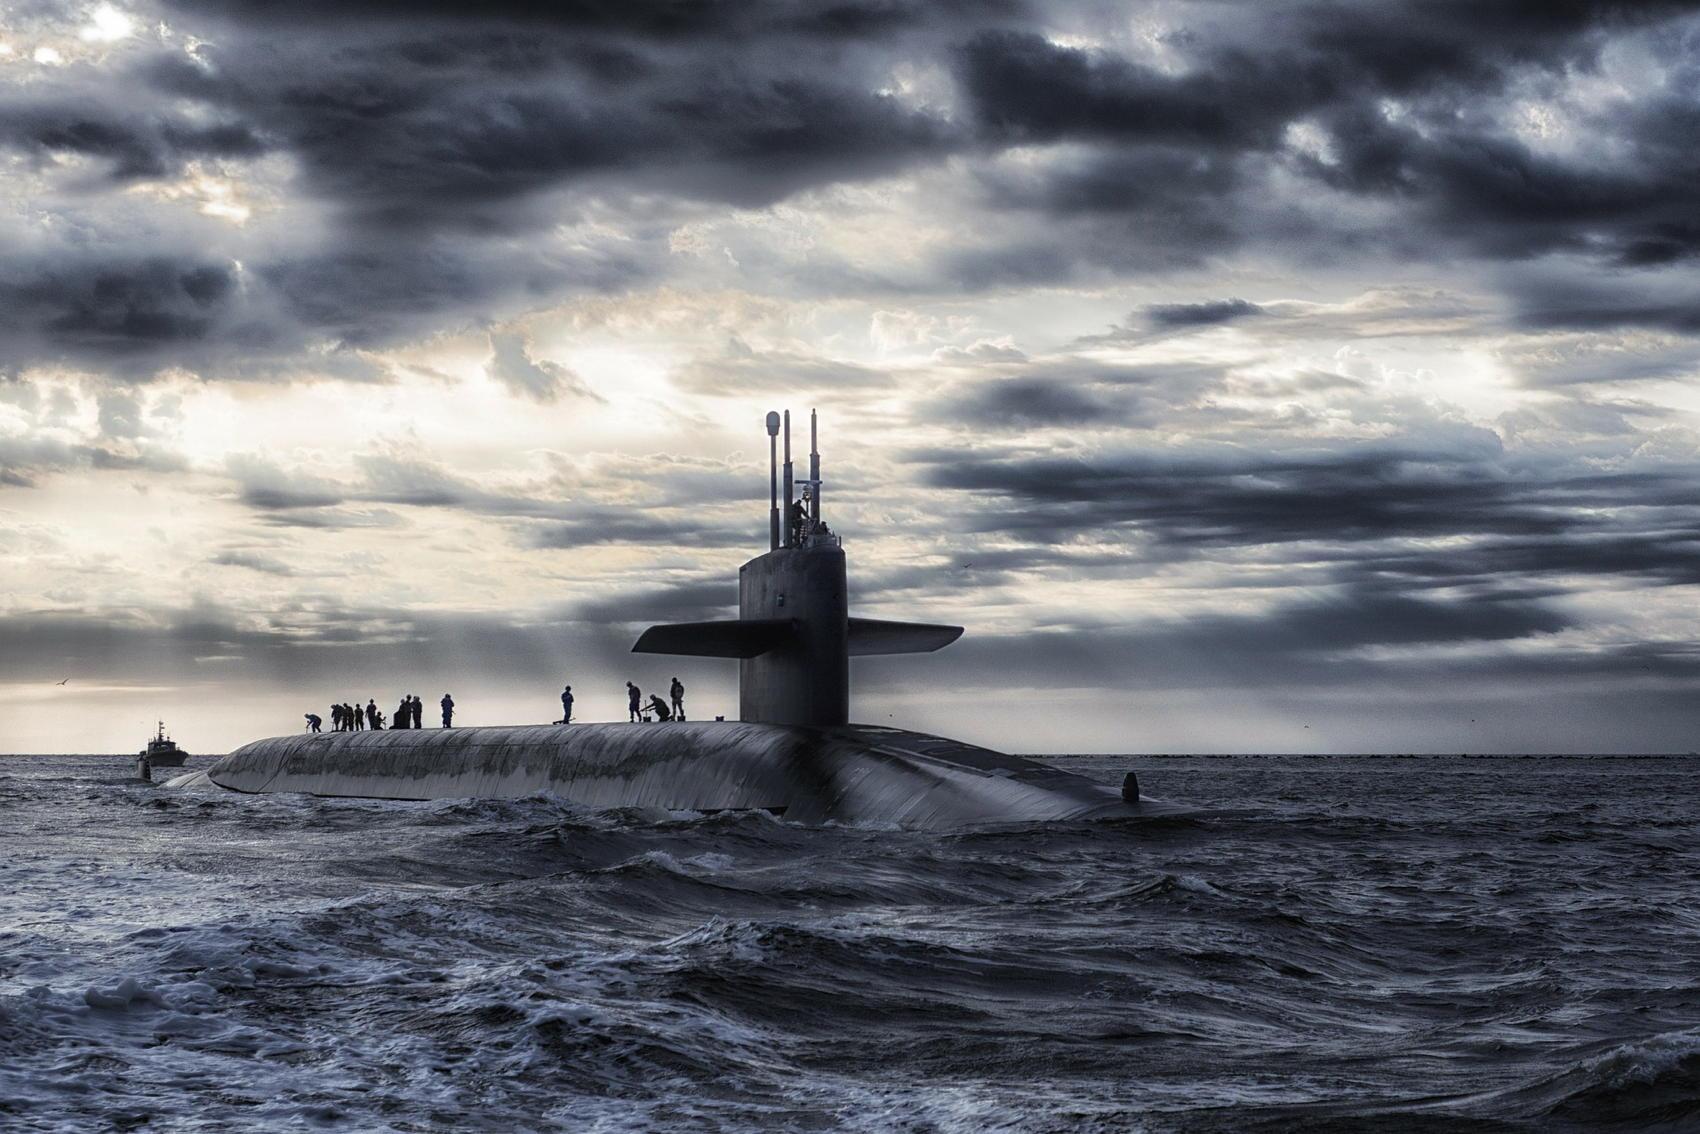 Submarine - Image by David Mark